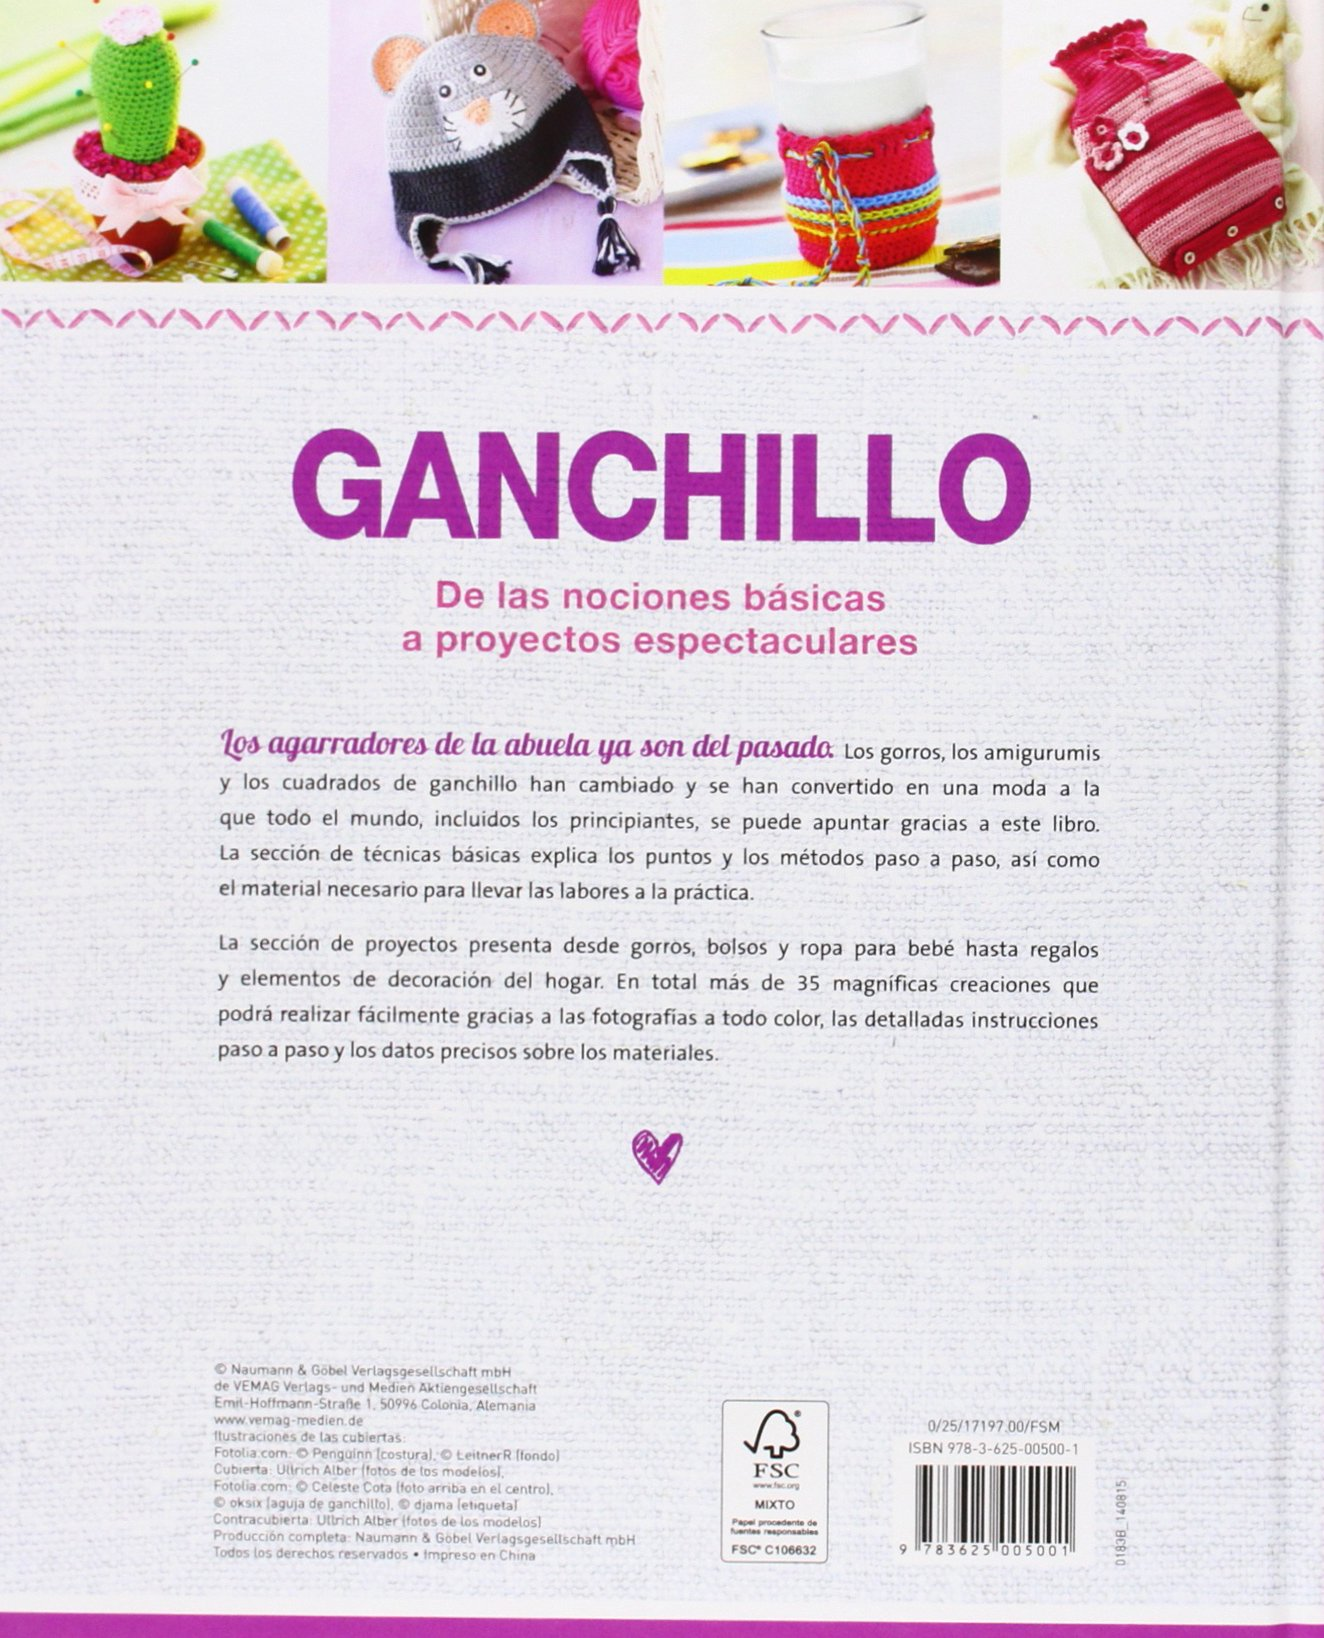 GANCHILLO - NGV: 9783625005001: Amazon.com: Books